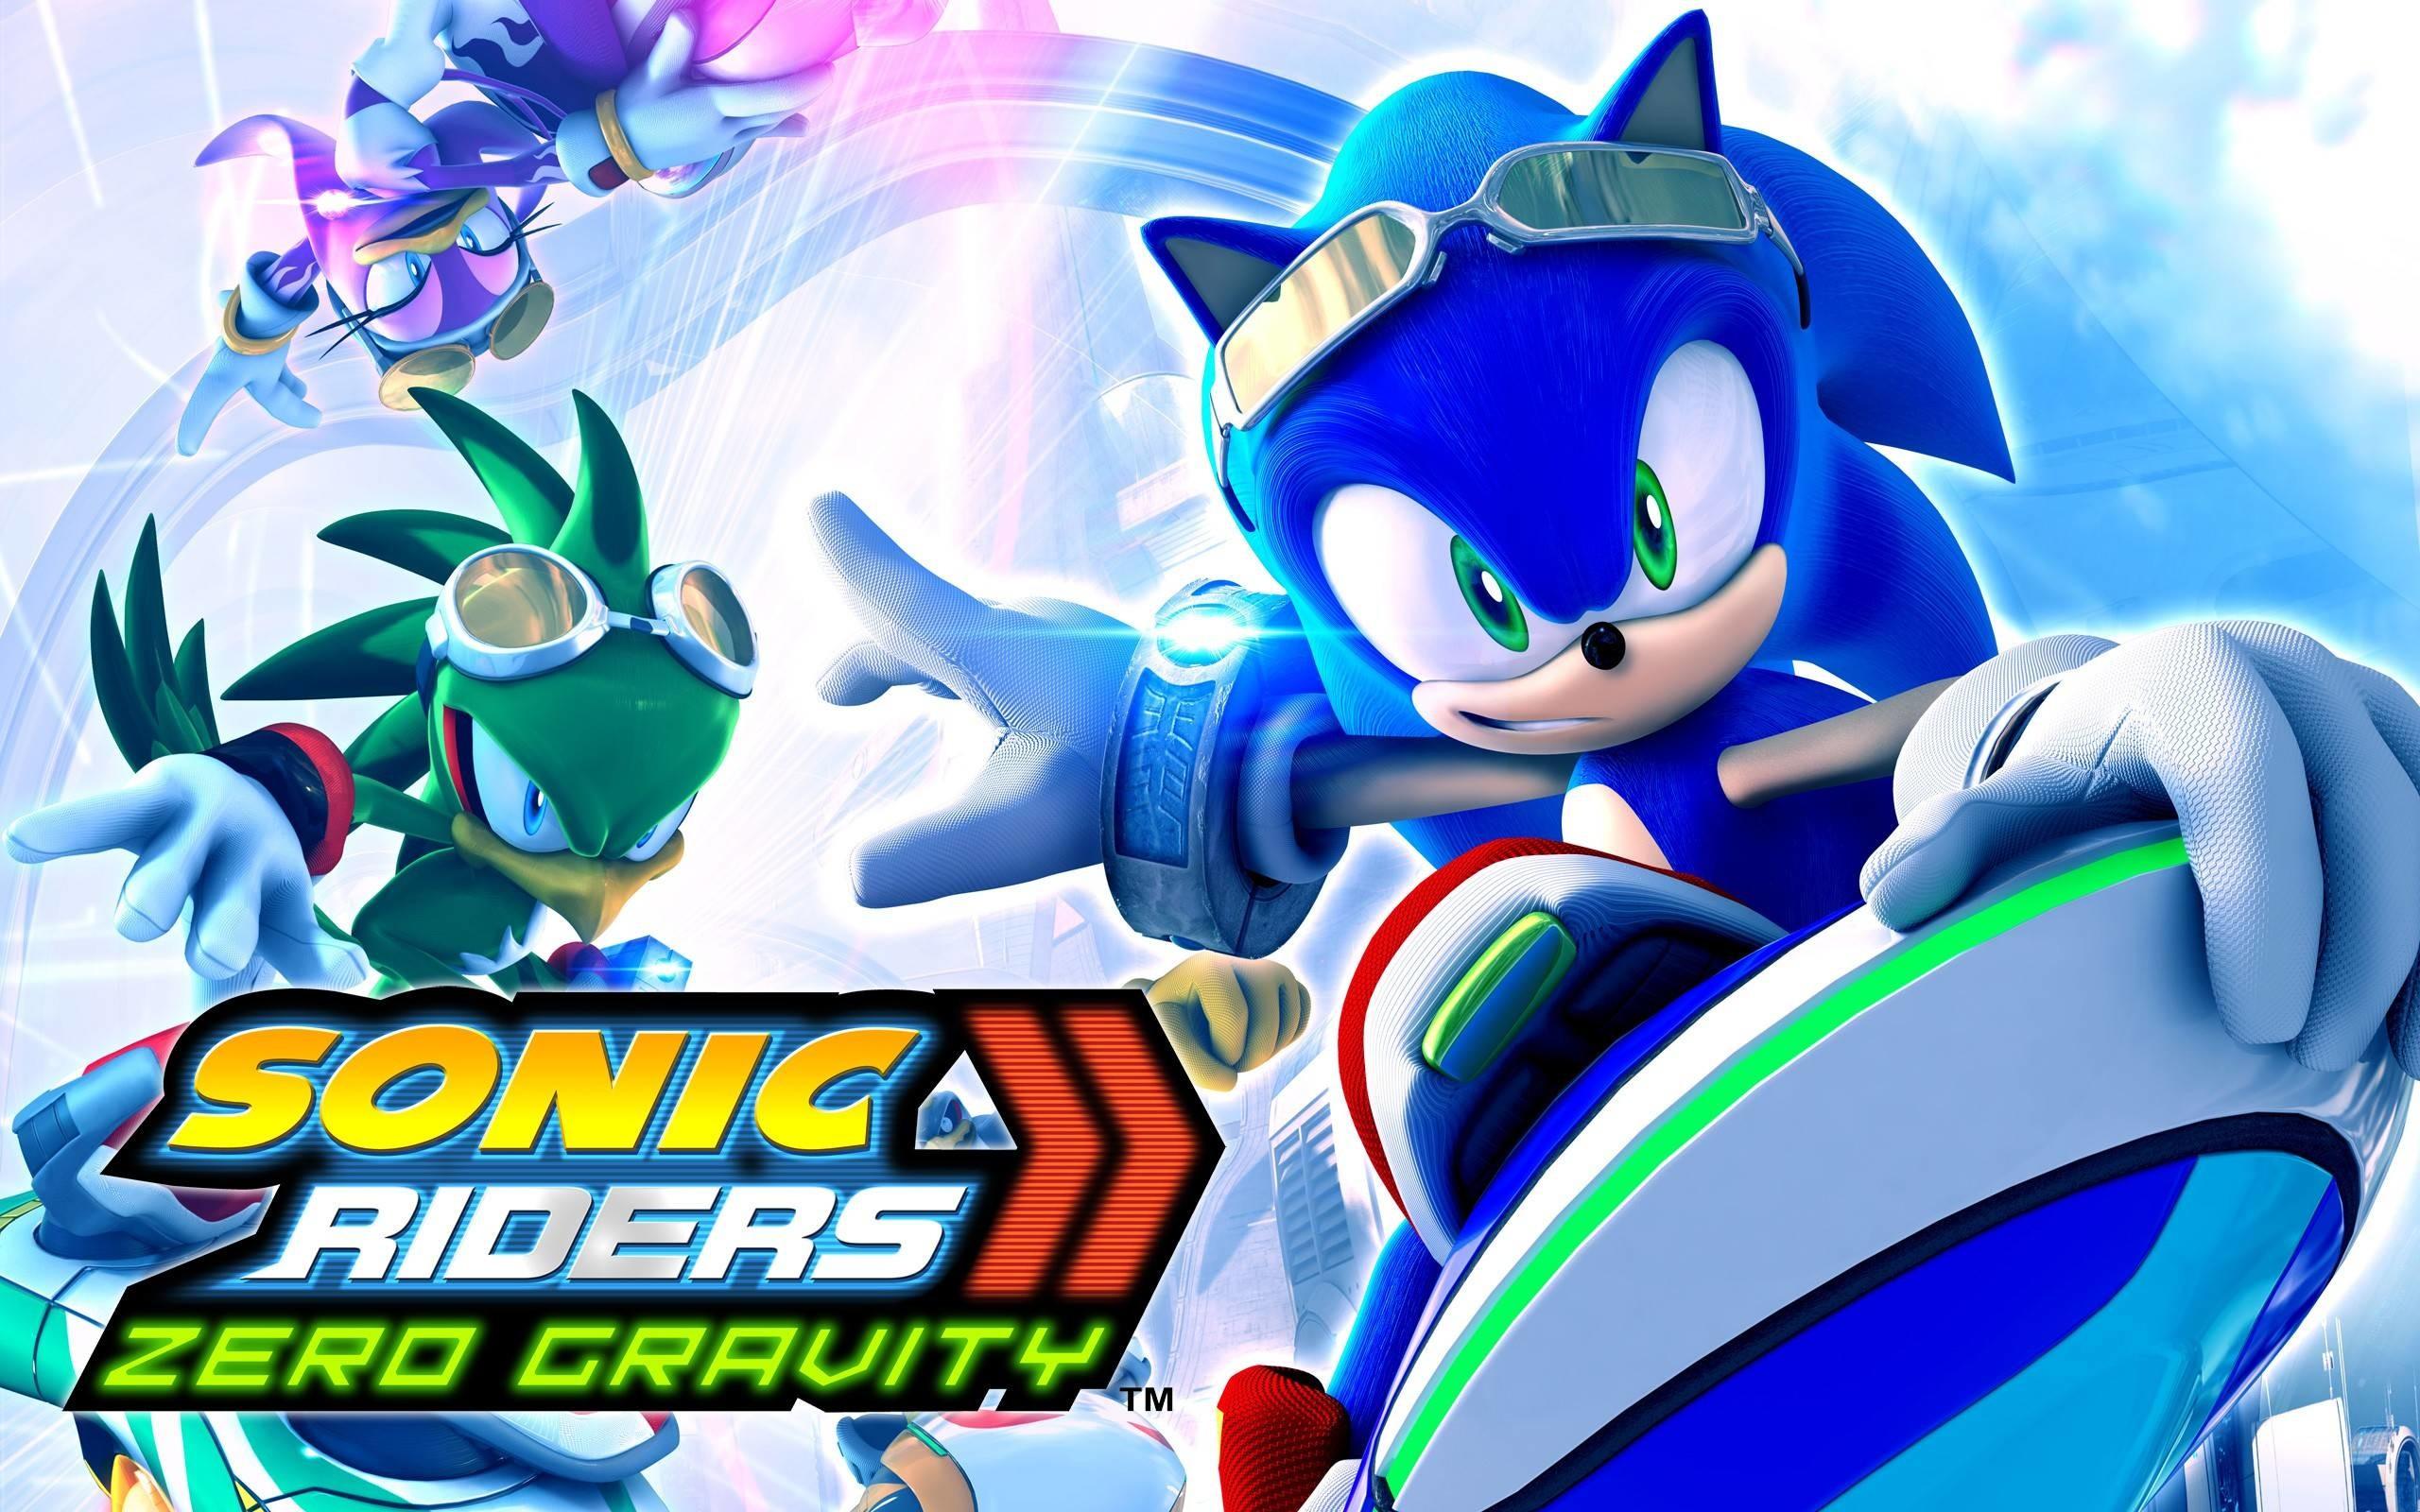 Video Game Sonic Riders: Zero Gravity Wallpaper px Free .